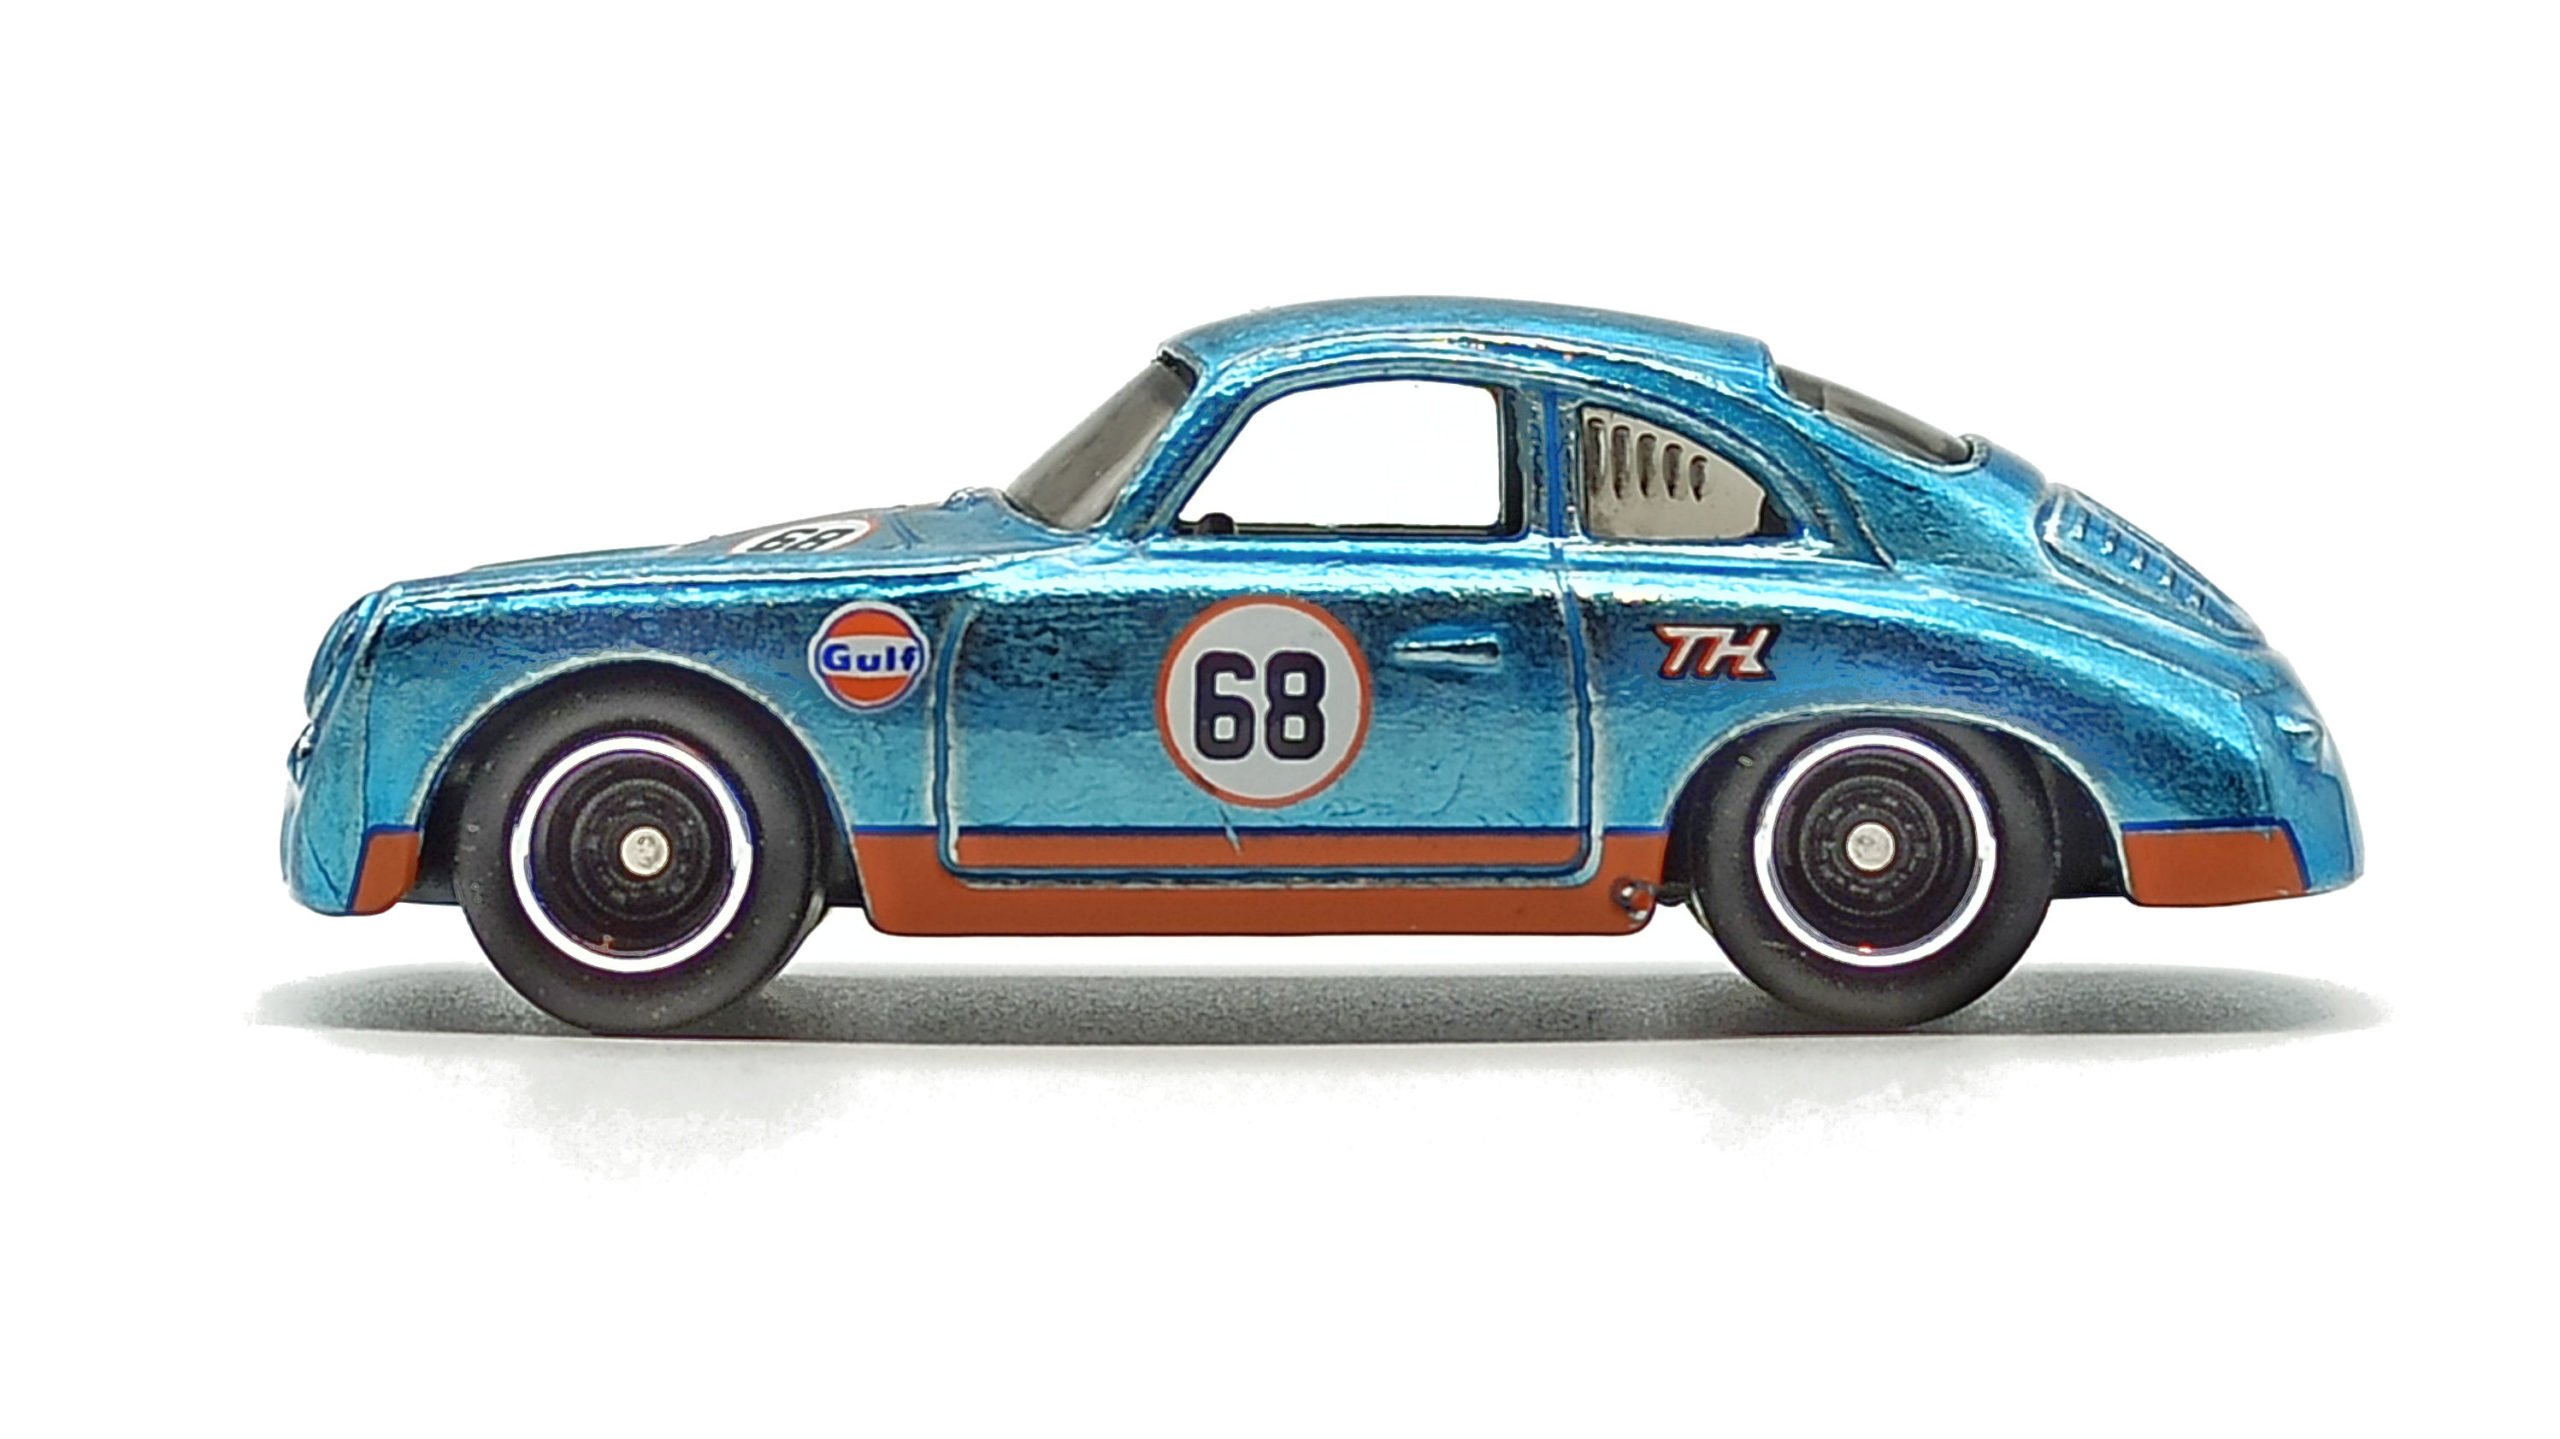 Hot Wheels Porsche 356 Outlaw (GTD08) 2021 (171/250) HW Speed Graphics (7/10) spectraflame light blue (Gulf) Super Treasure Hunt (STH) side